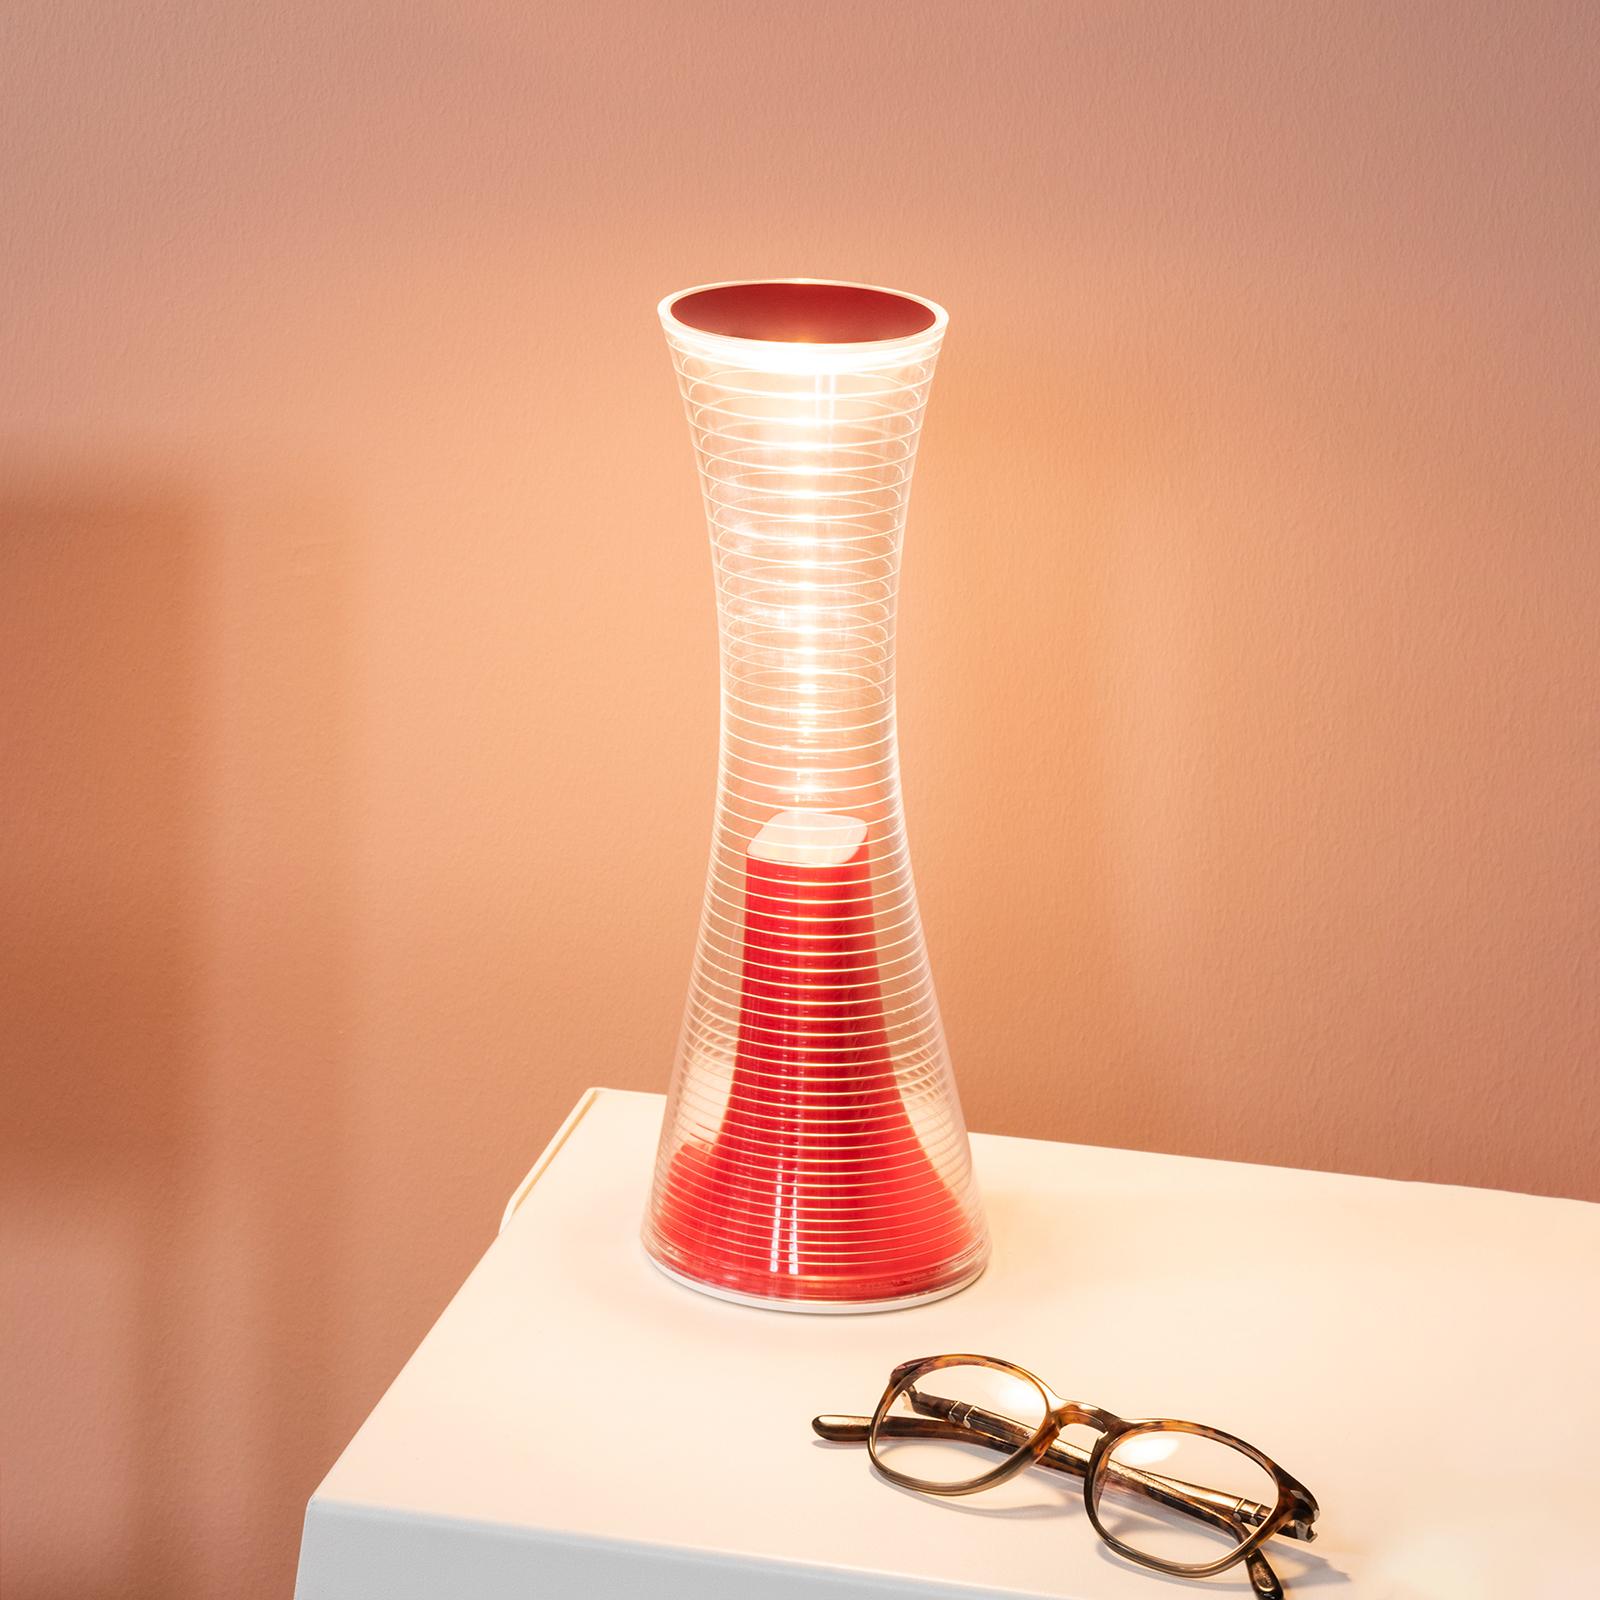 Artemide Come Together lampa stołowa LED czerwona